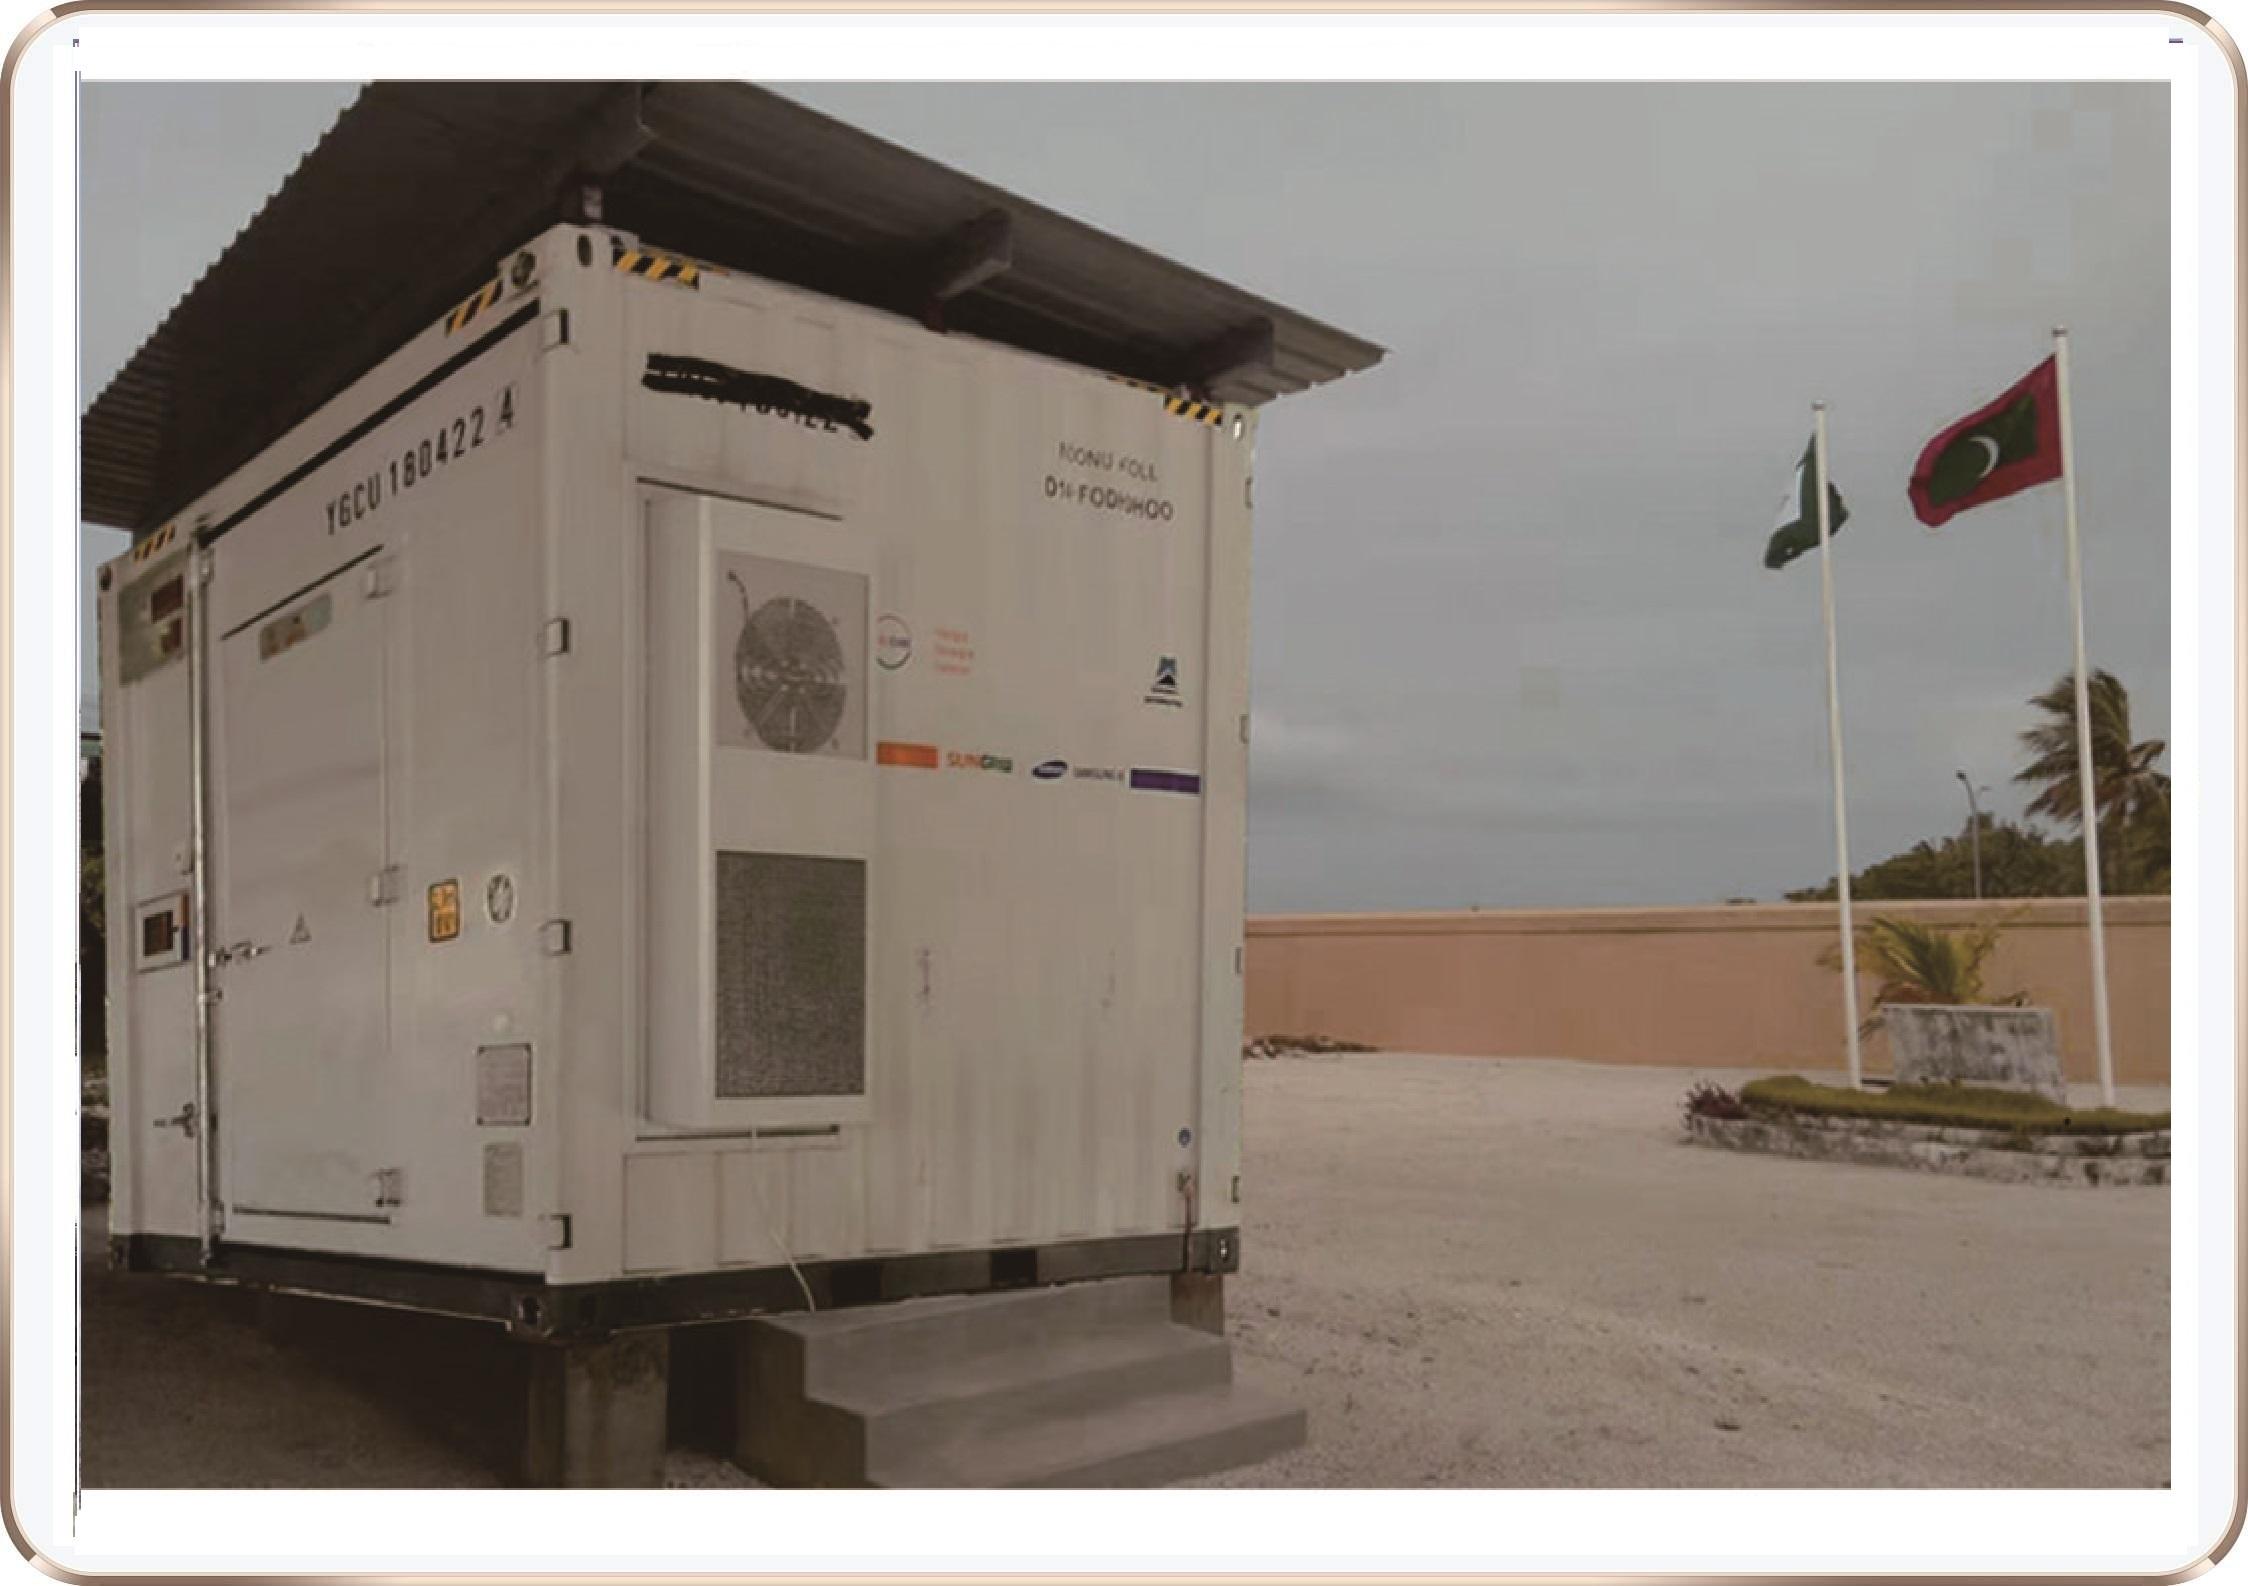 UL认证户外机柜空调